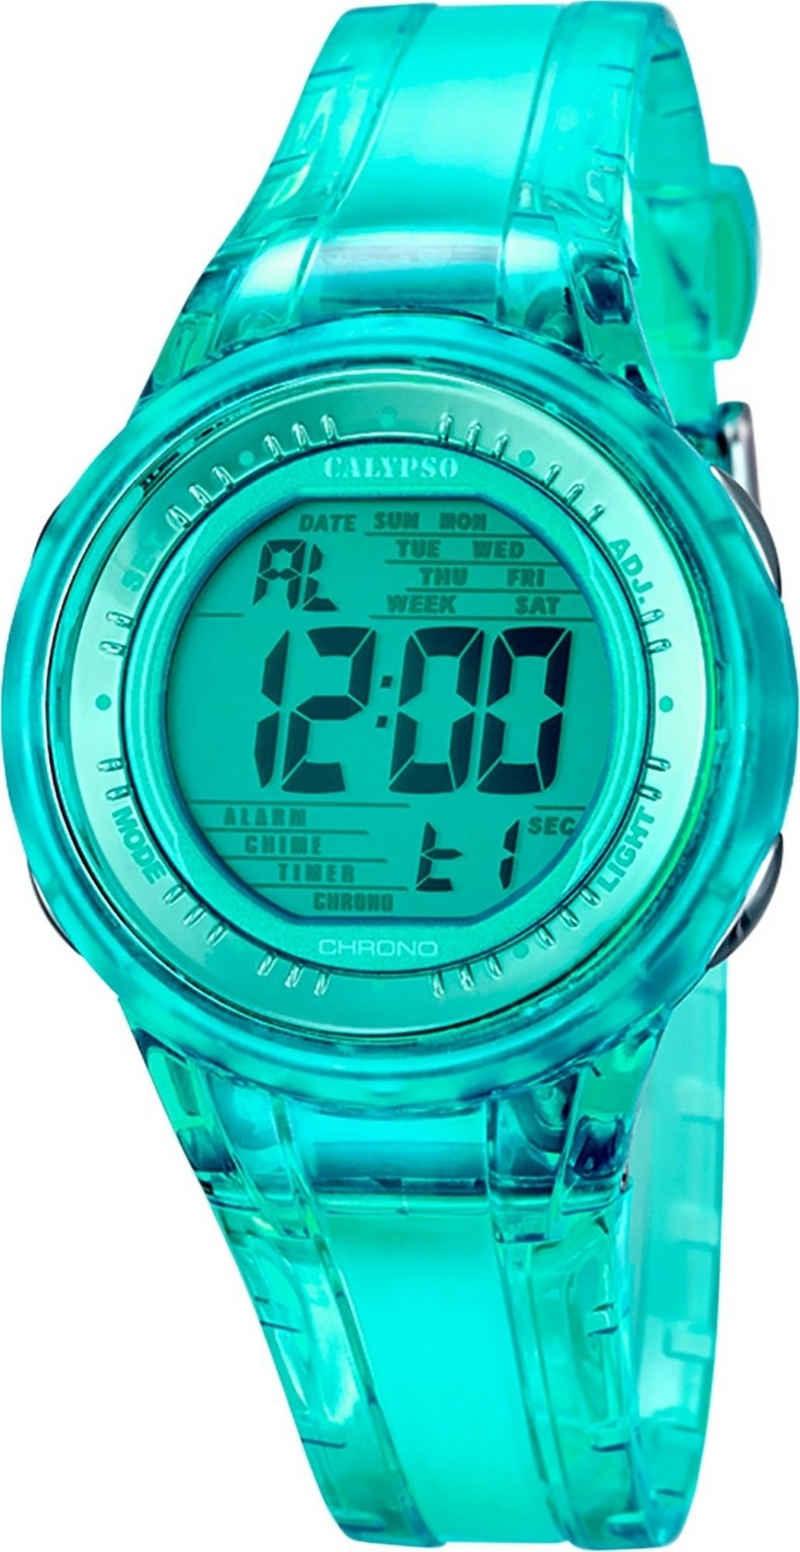 CALYPSO WATCHES Digitaluhr »UK5688/4 Calypso Damen Uhr K5688/4 Kunststoff PUR«, (Digitaluhr), Damen Armbanduhr rund, PURarmband grün, Sport